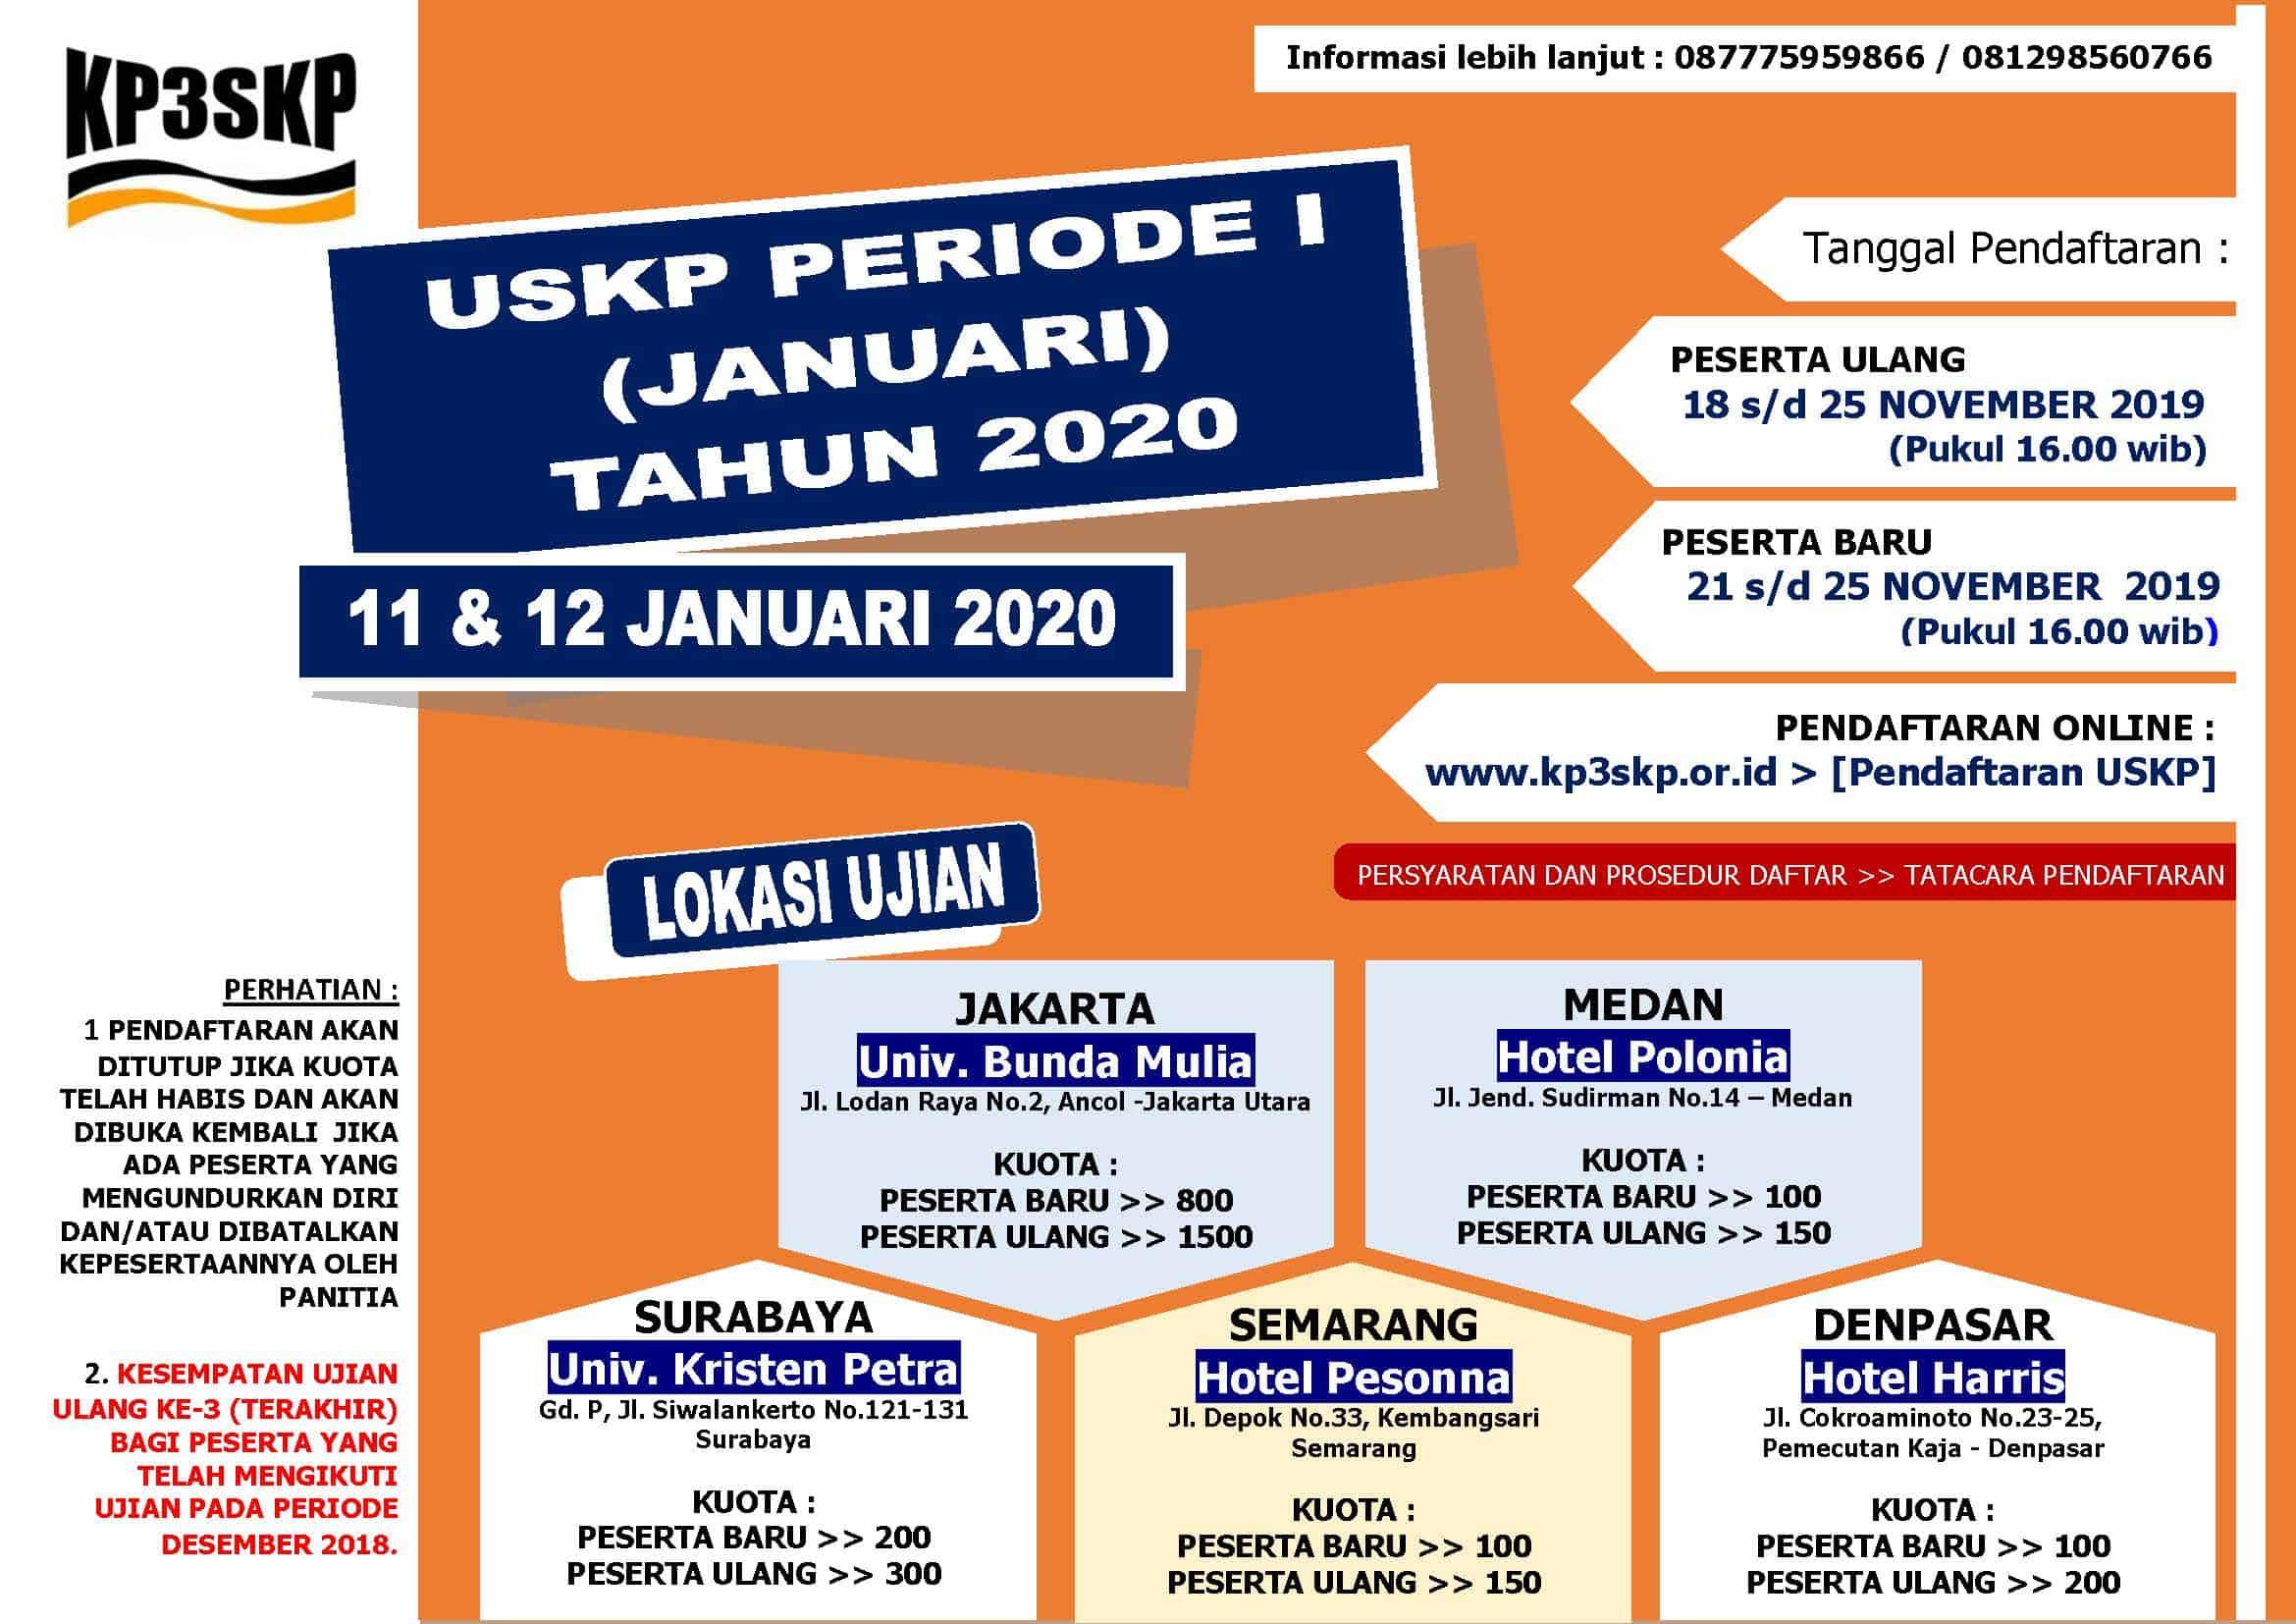 Jadwal Ujian USKP Januari 2020